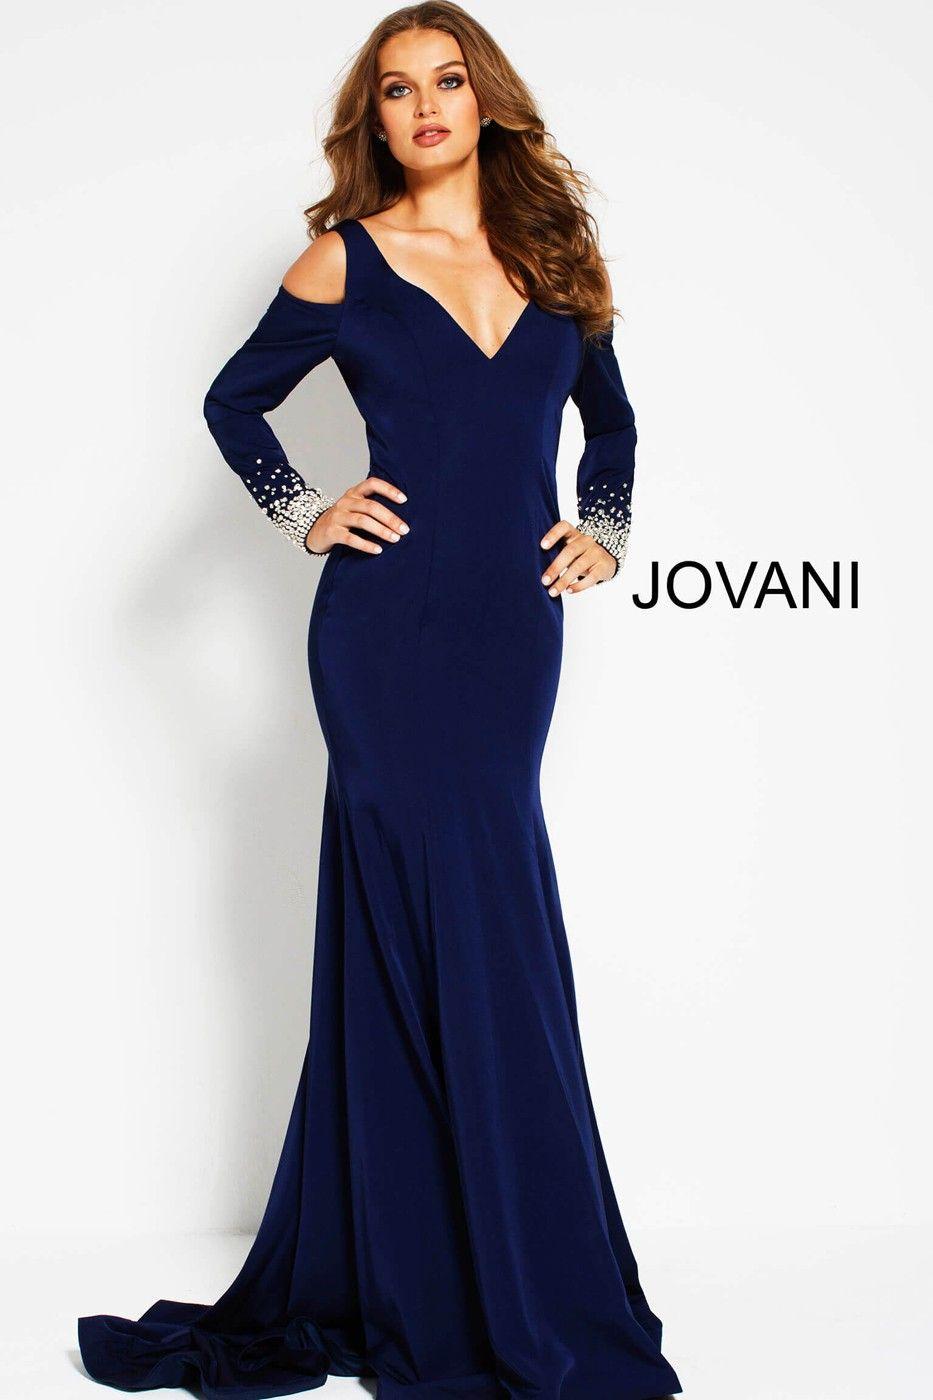 Jovani dress style prom dresses pinterest